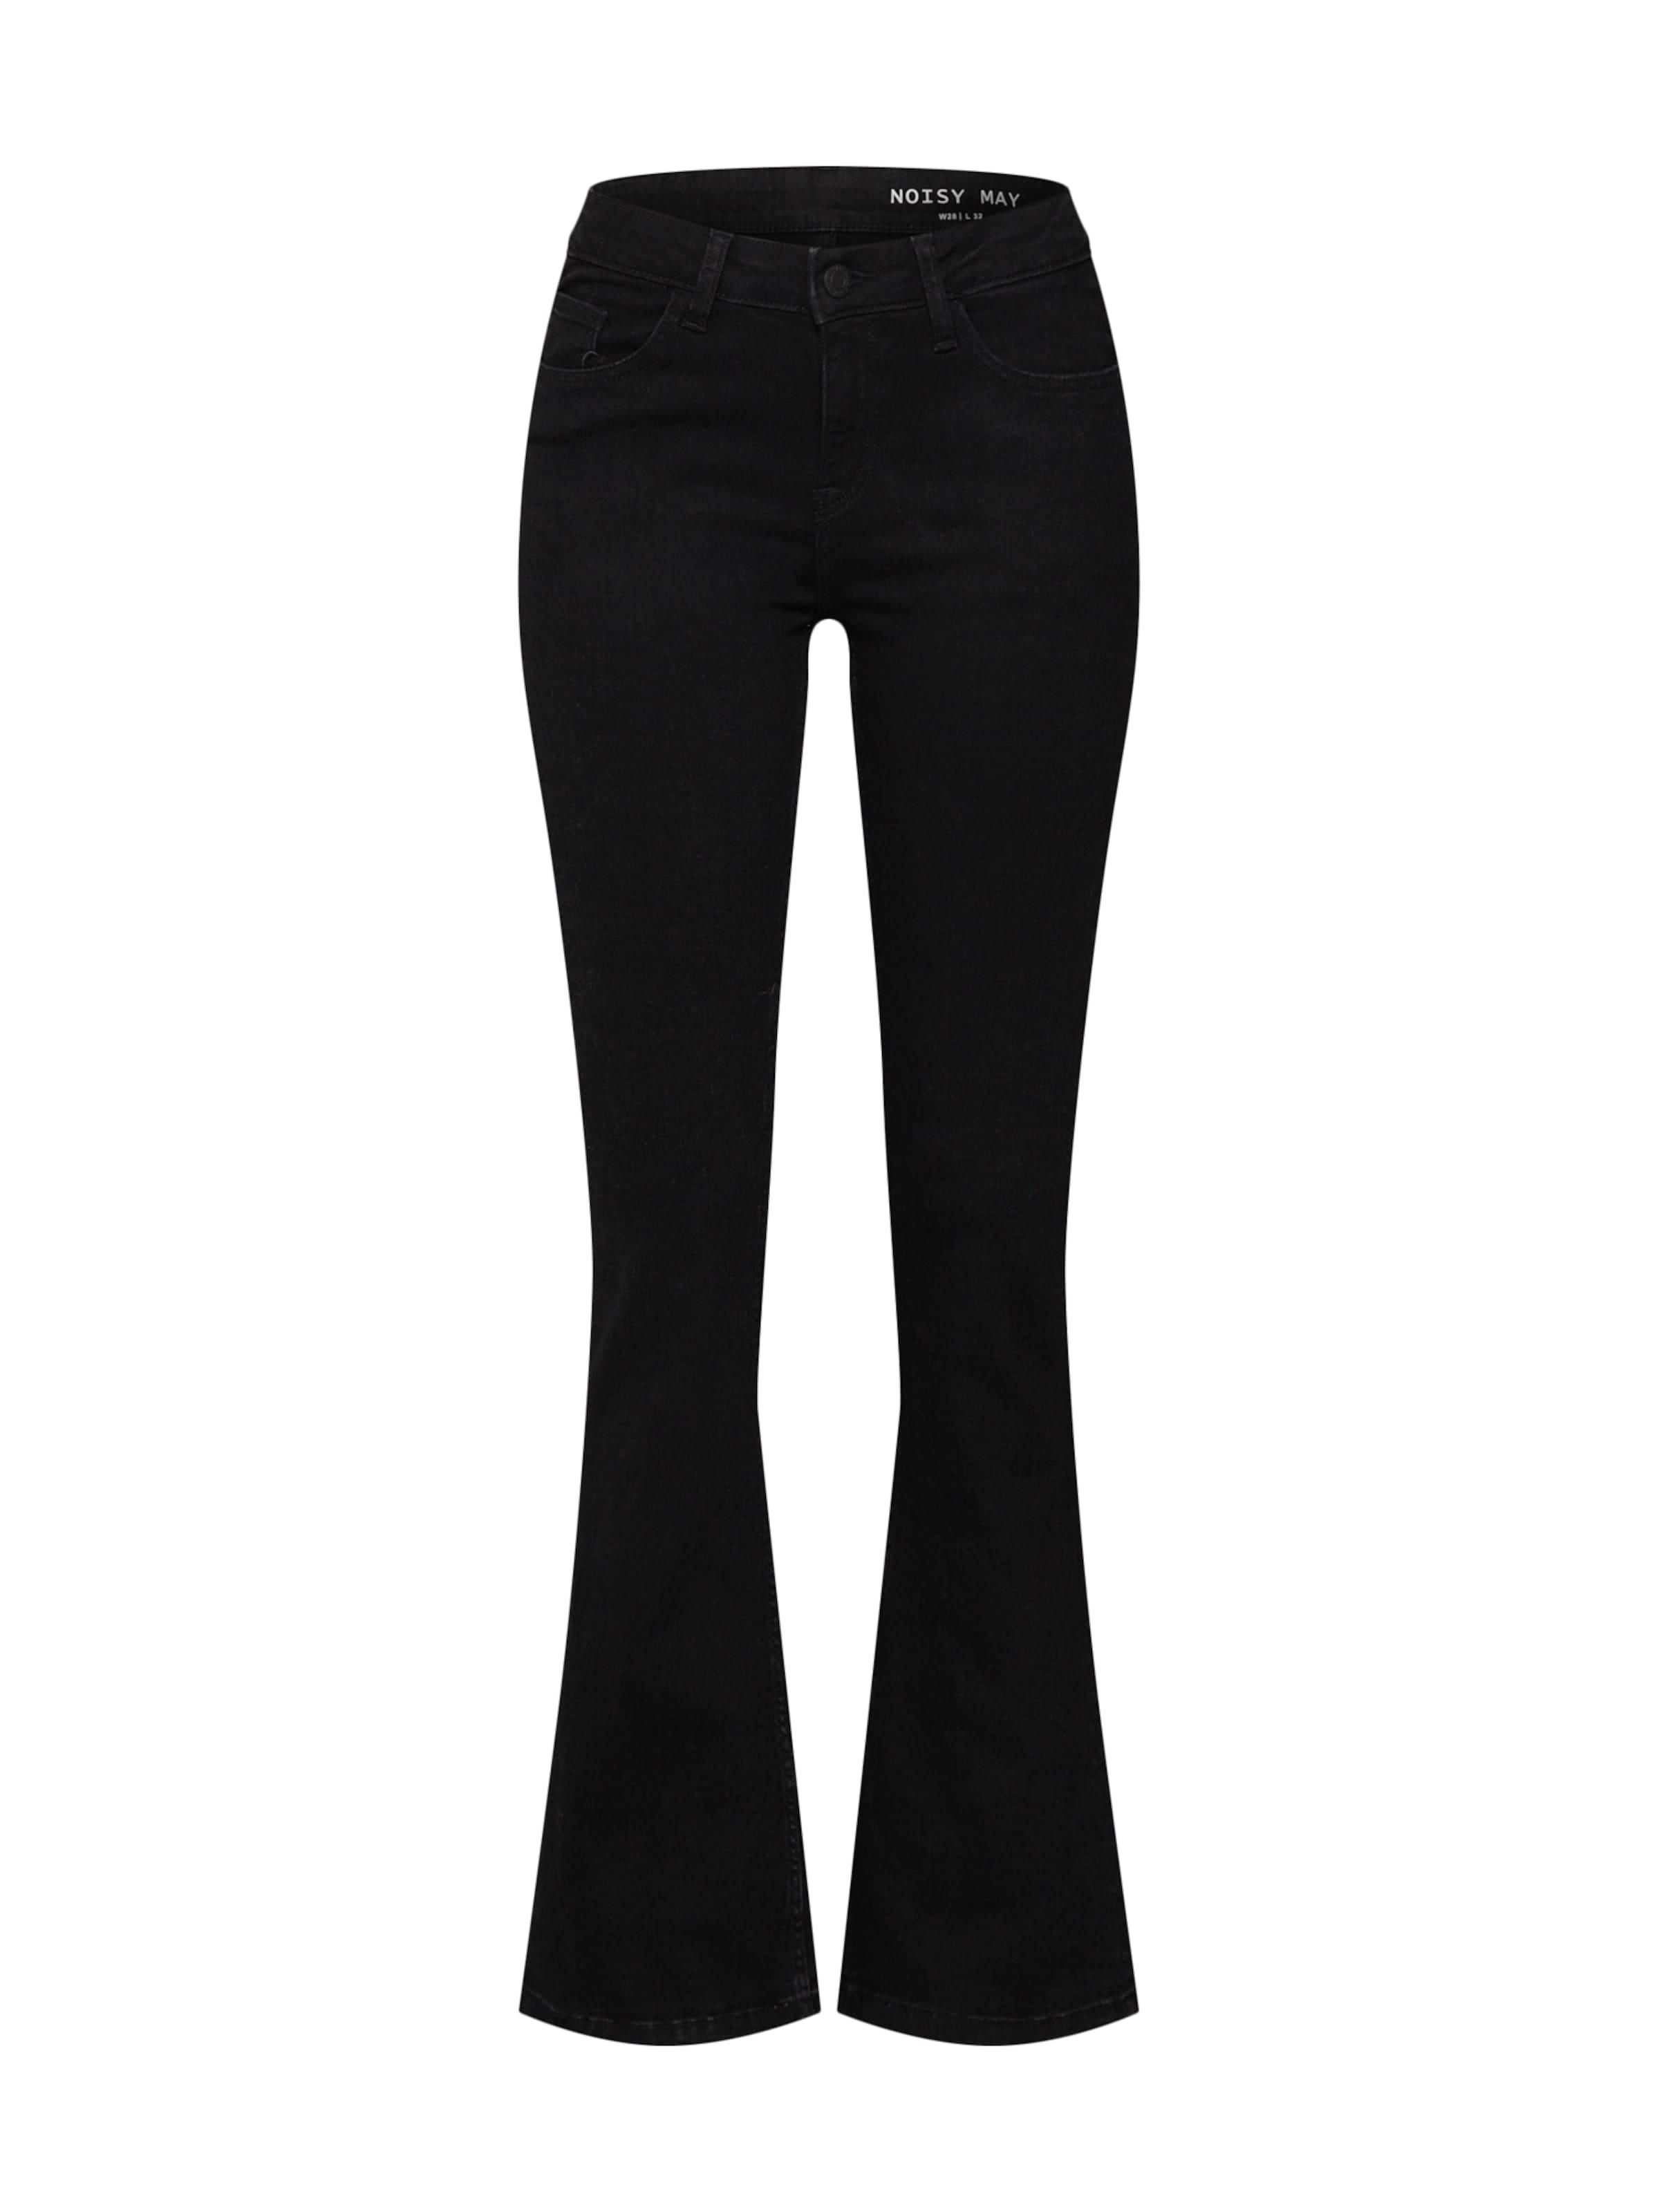 In May Black Jeans Noisy Denim YWD2I9bEeH